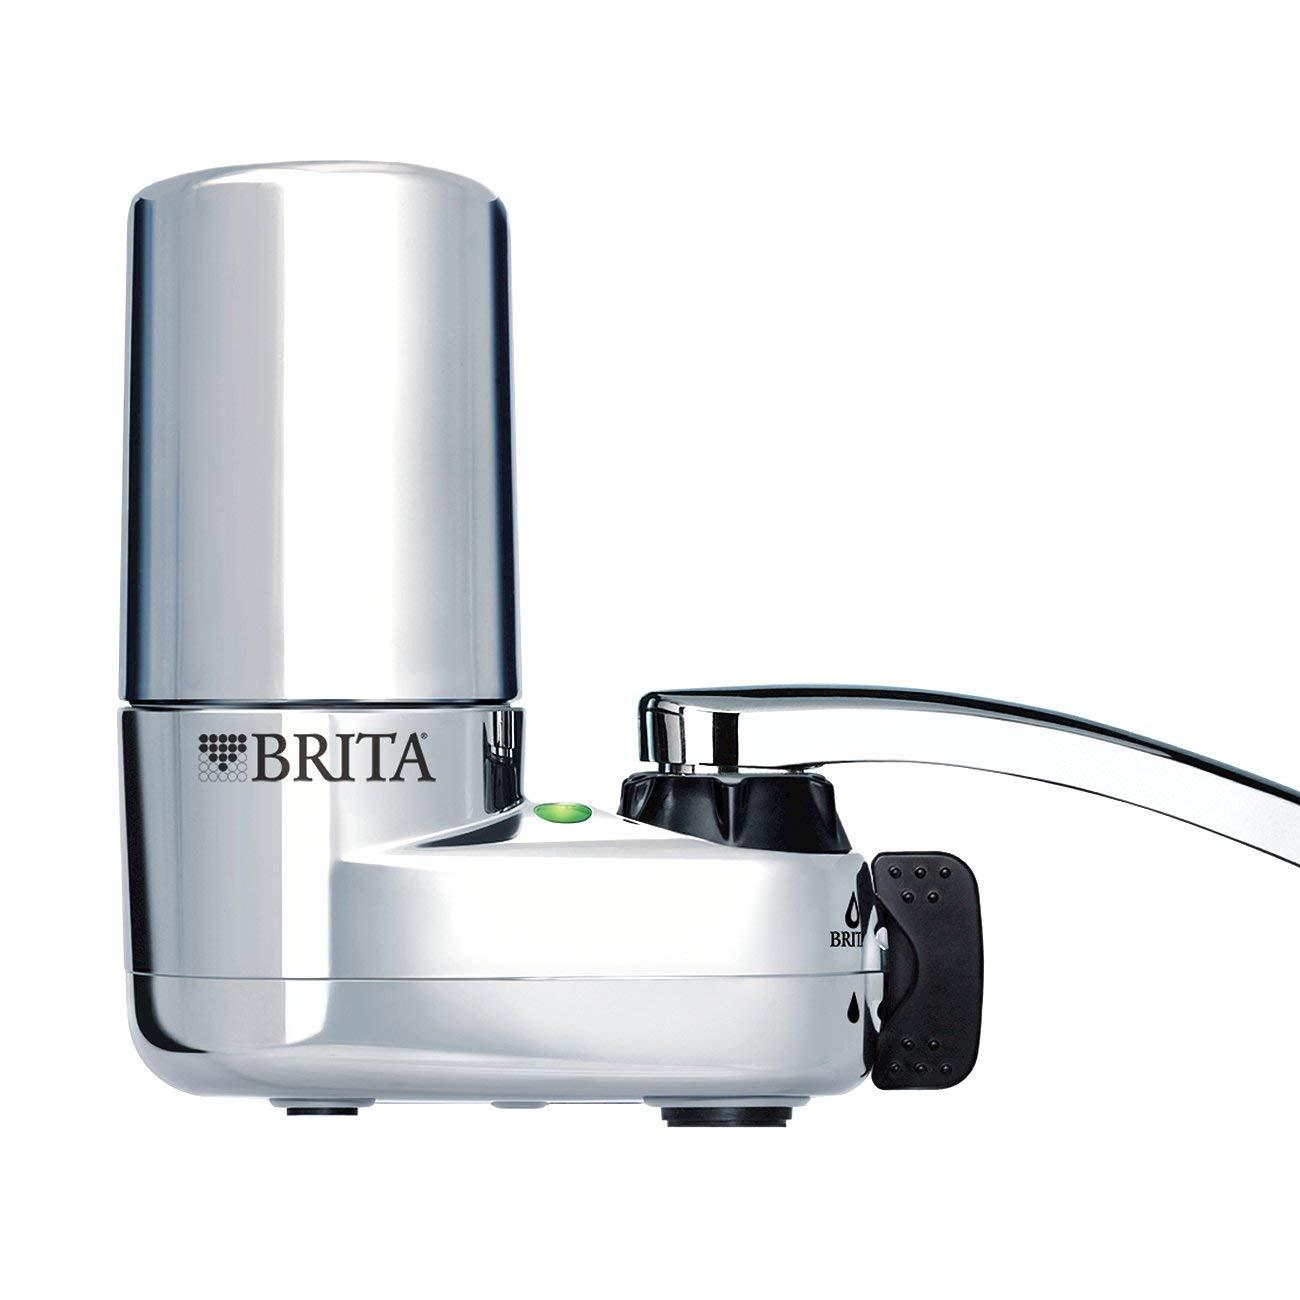 Brita tap water filter system (1.00603e+13)